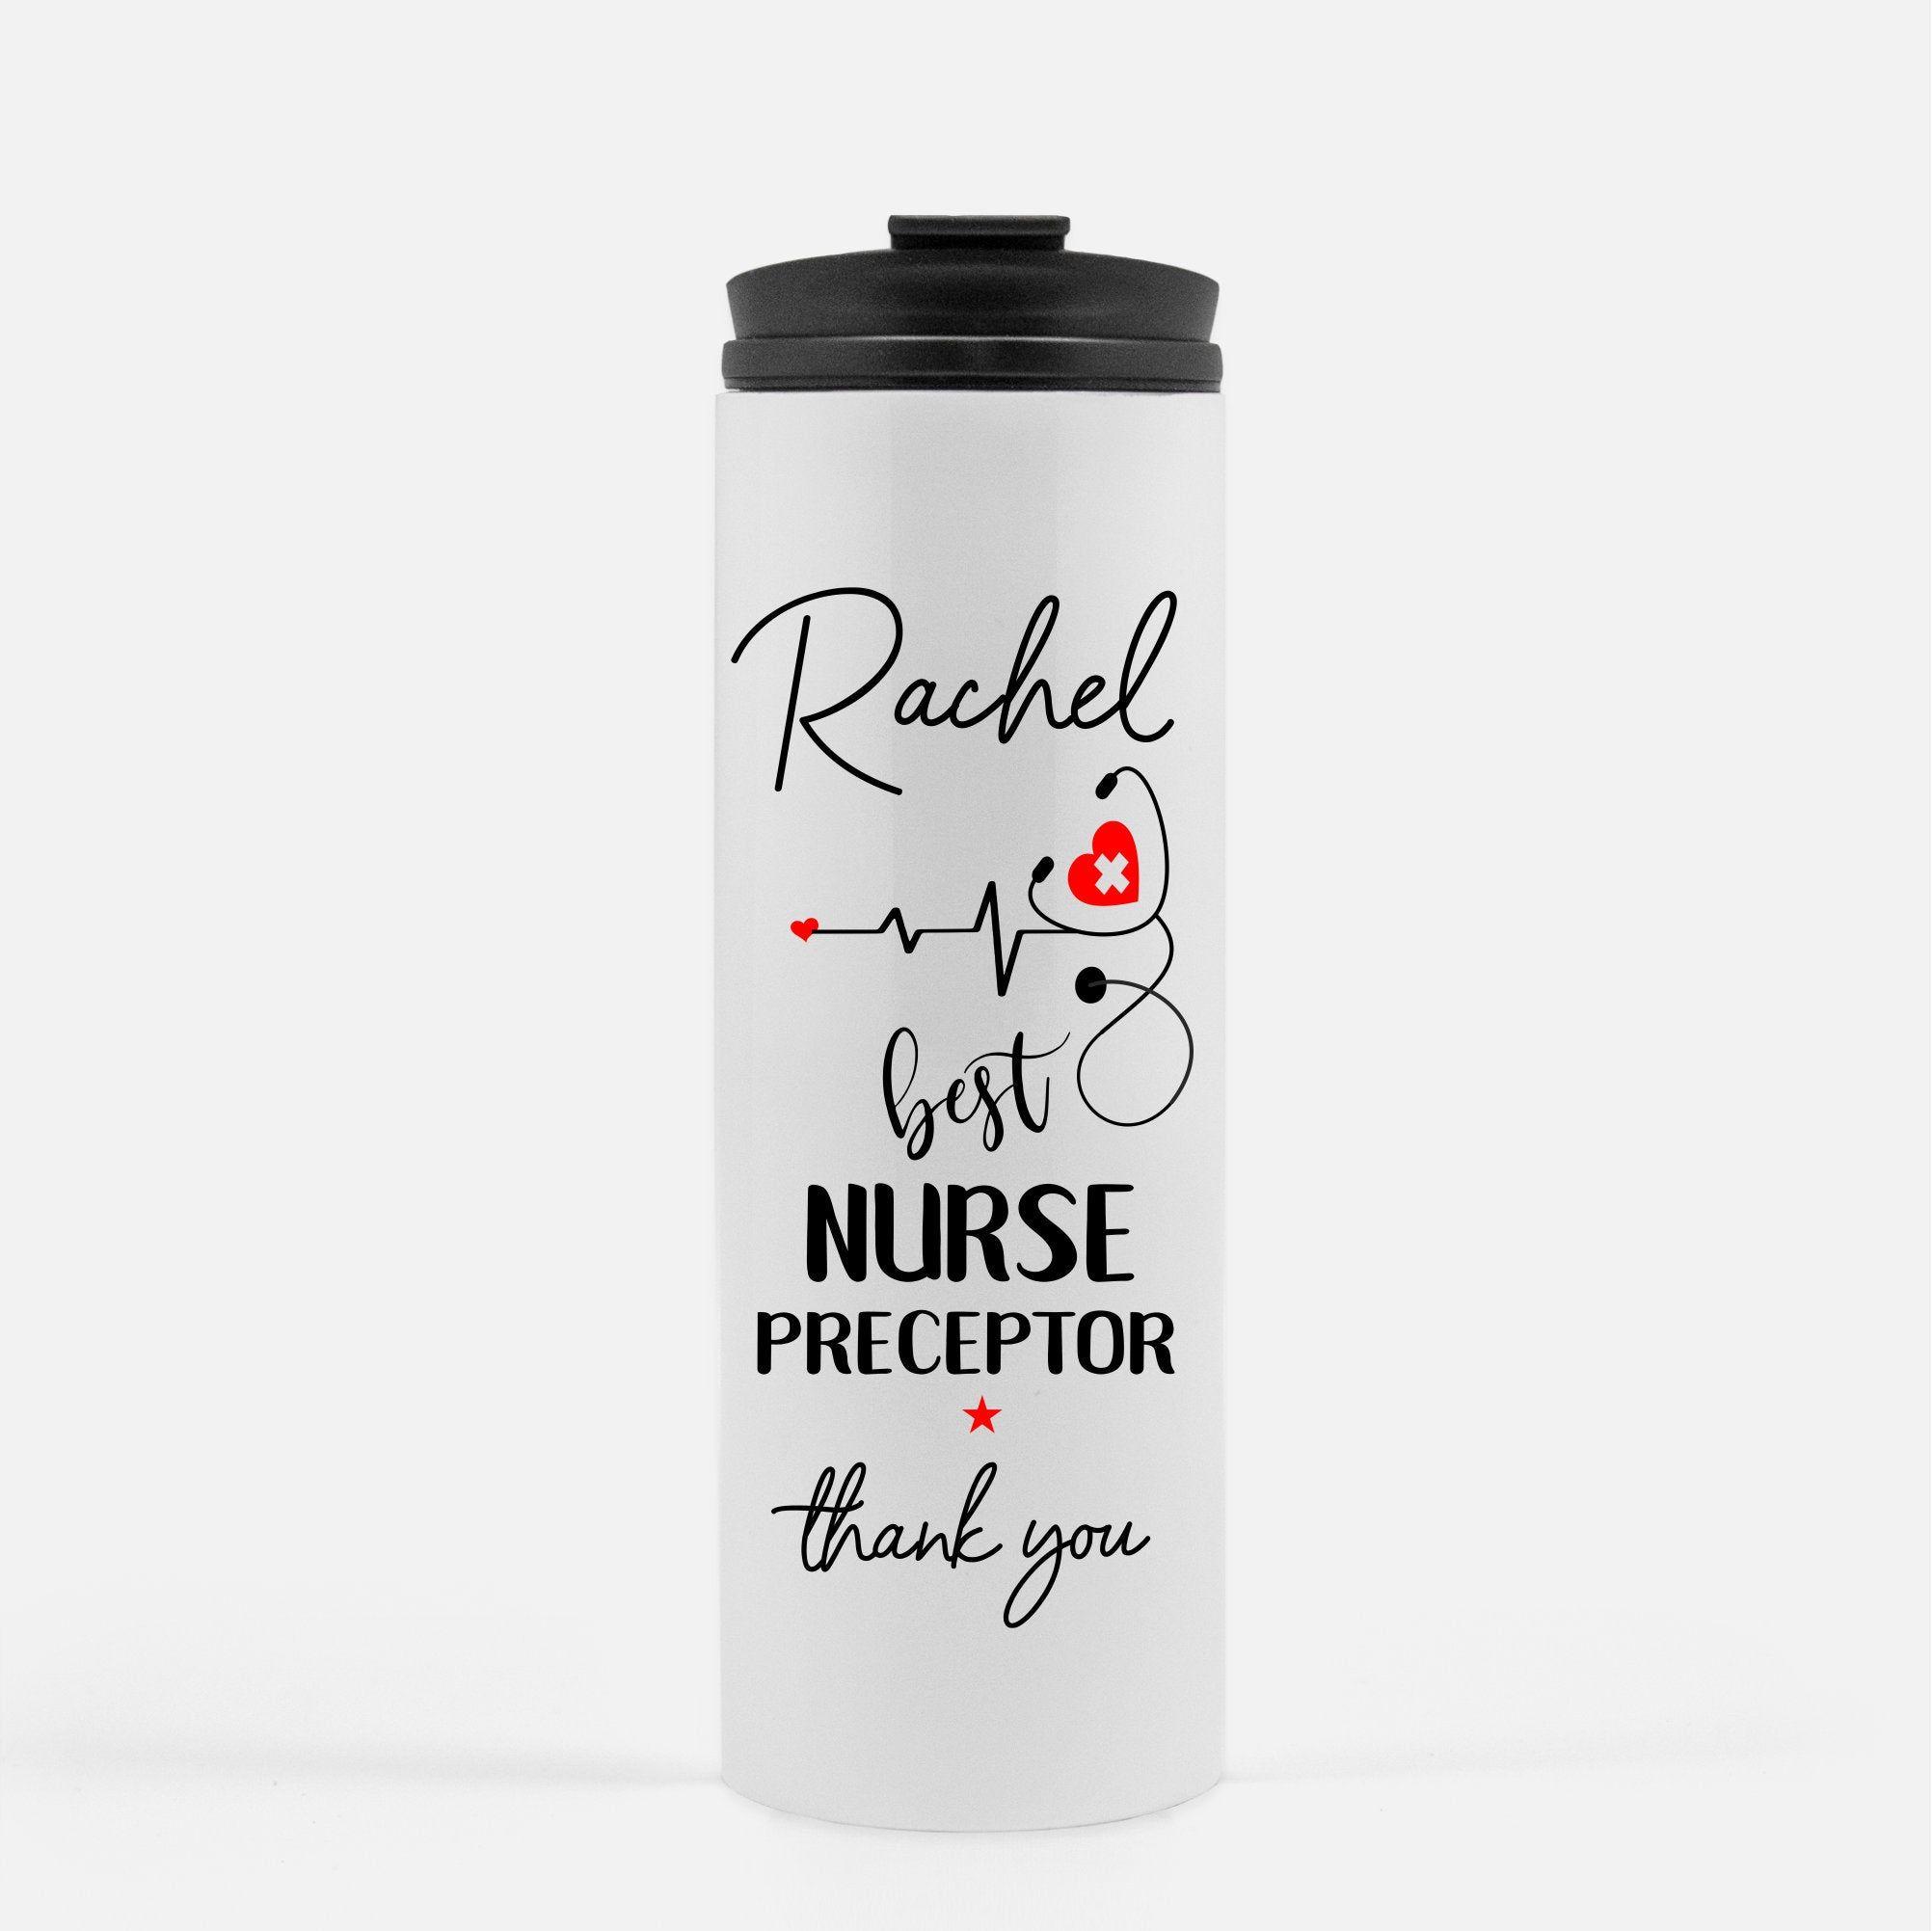 Best nurse preceptor gift travel mug personalized design